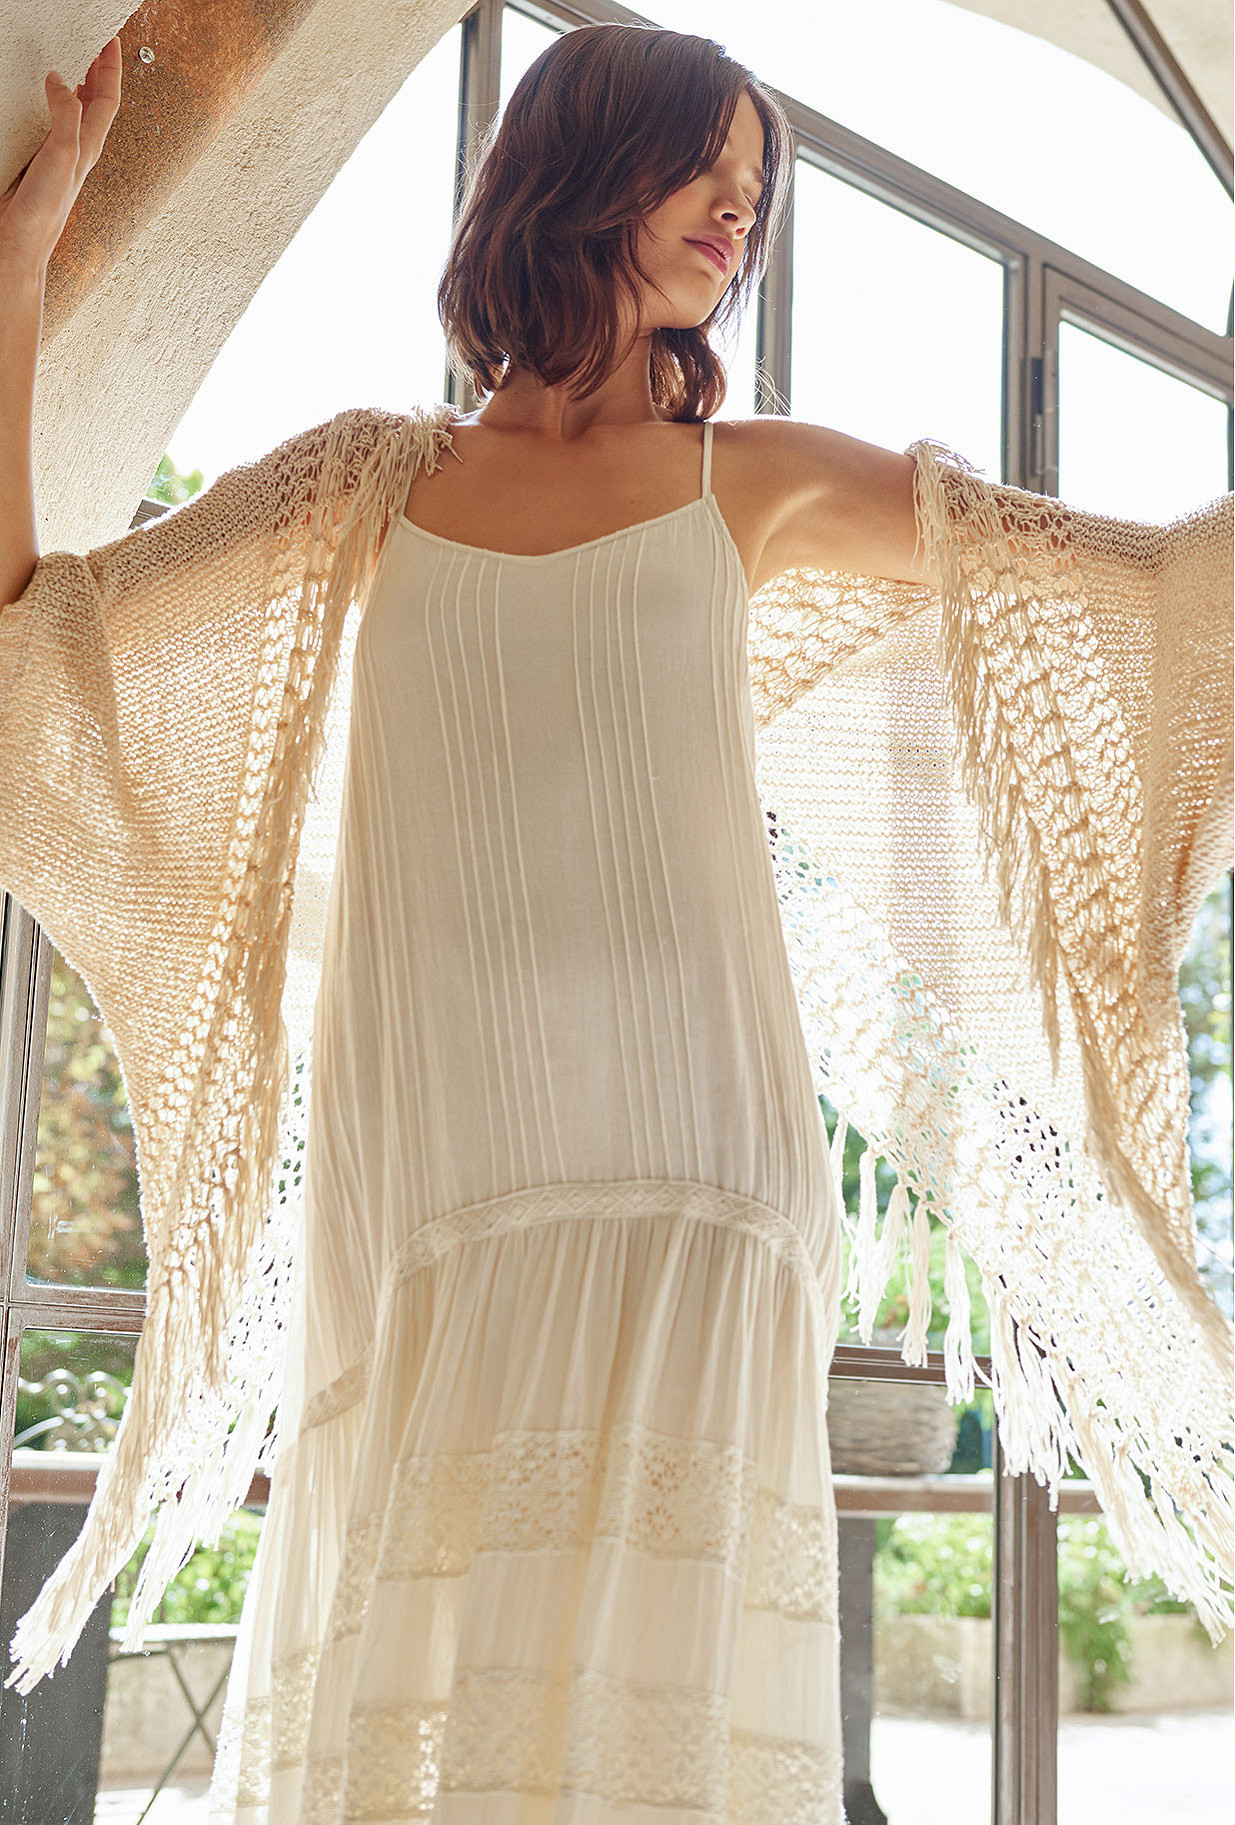 White  Dress  Gloria Mes demoiselles fashion clothes designer Paris